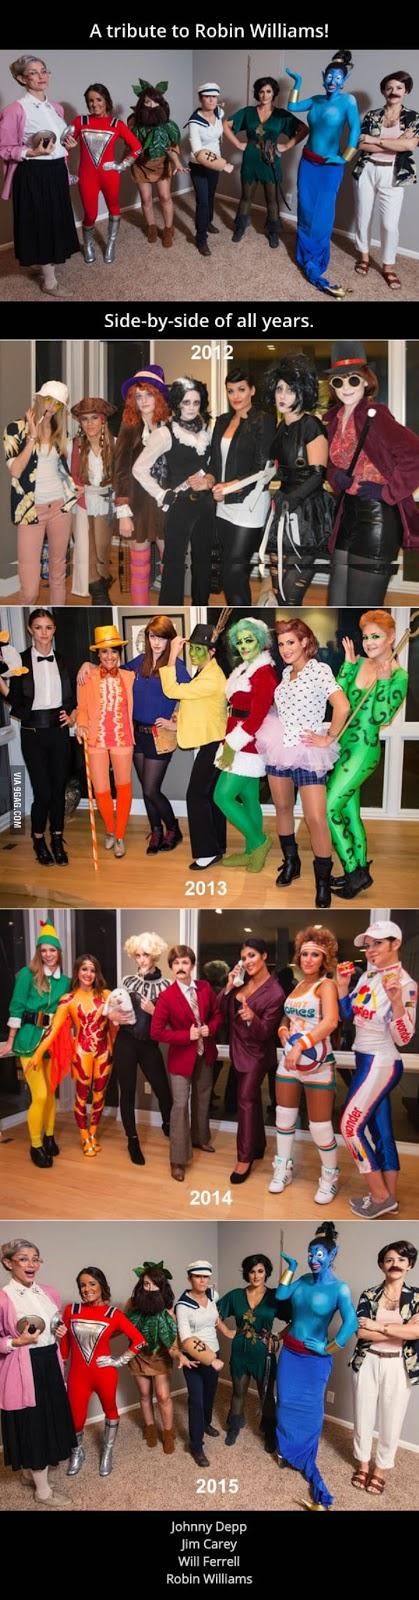 Group Costume Robin Williams, Jim Carey, Johnny Depp etc